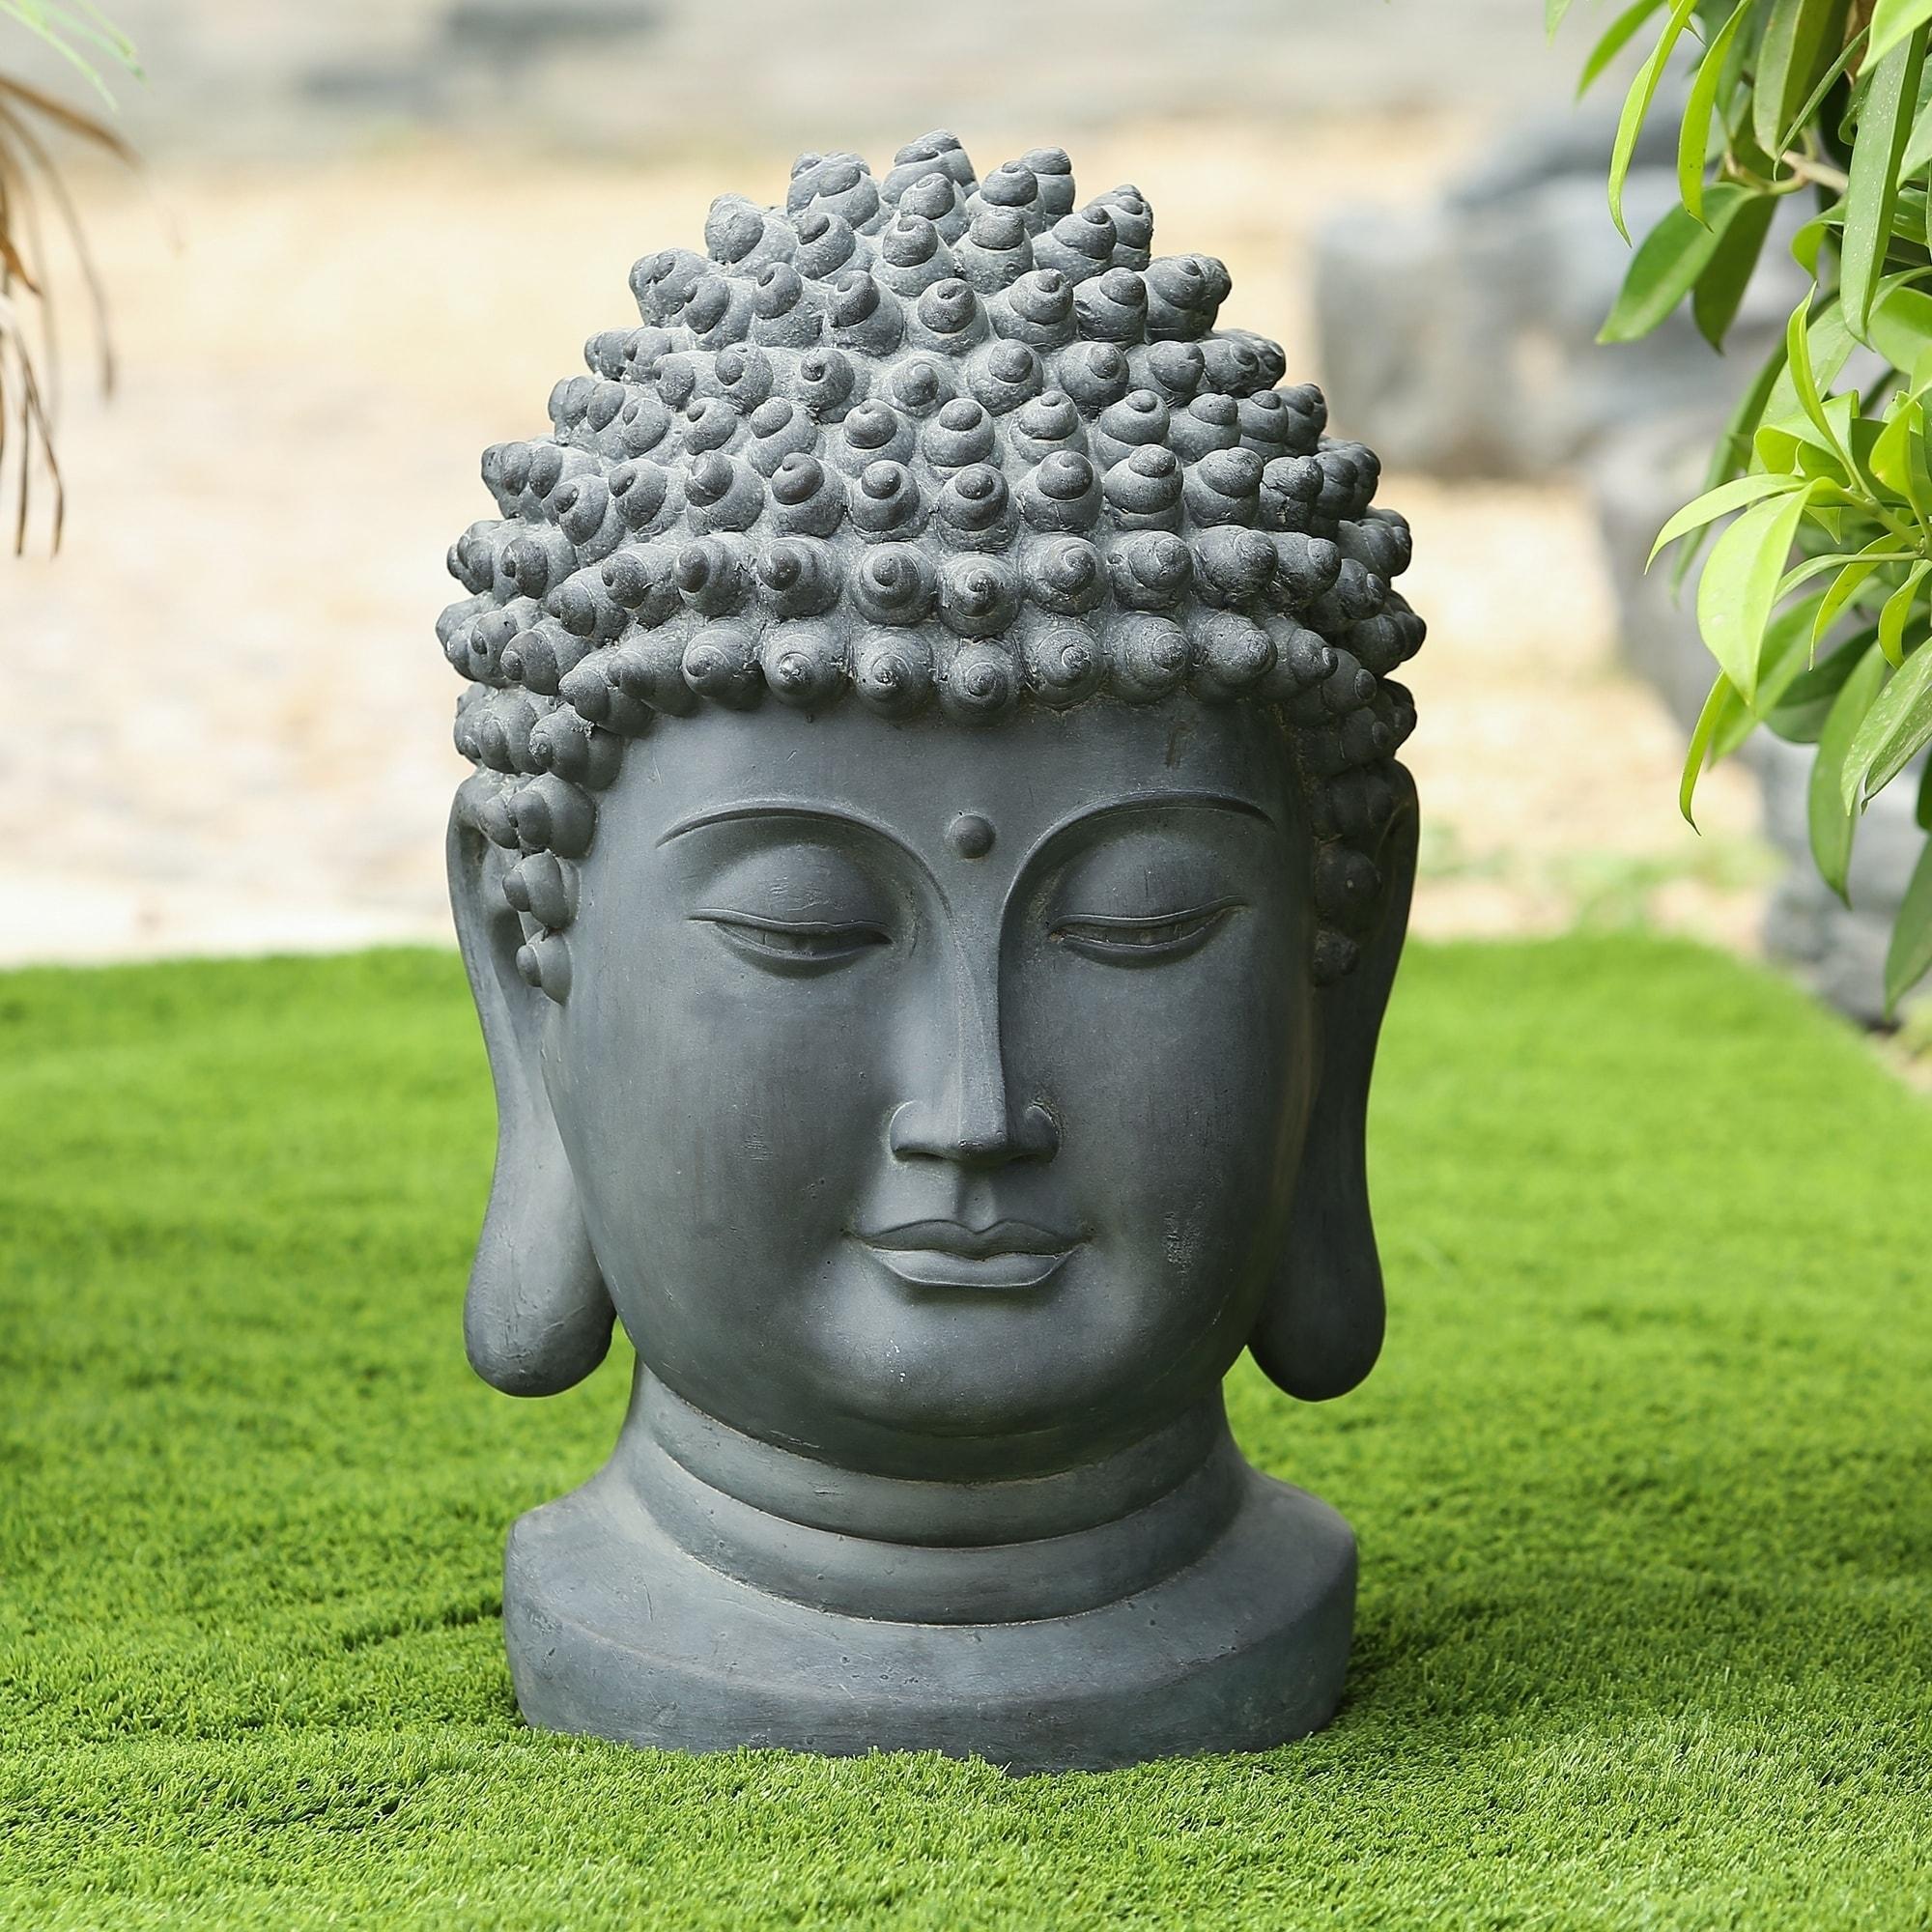 Buddha Head Garden Outdoor Statue Overstock 20463704